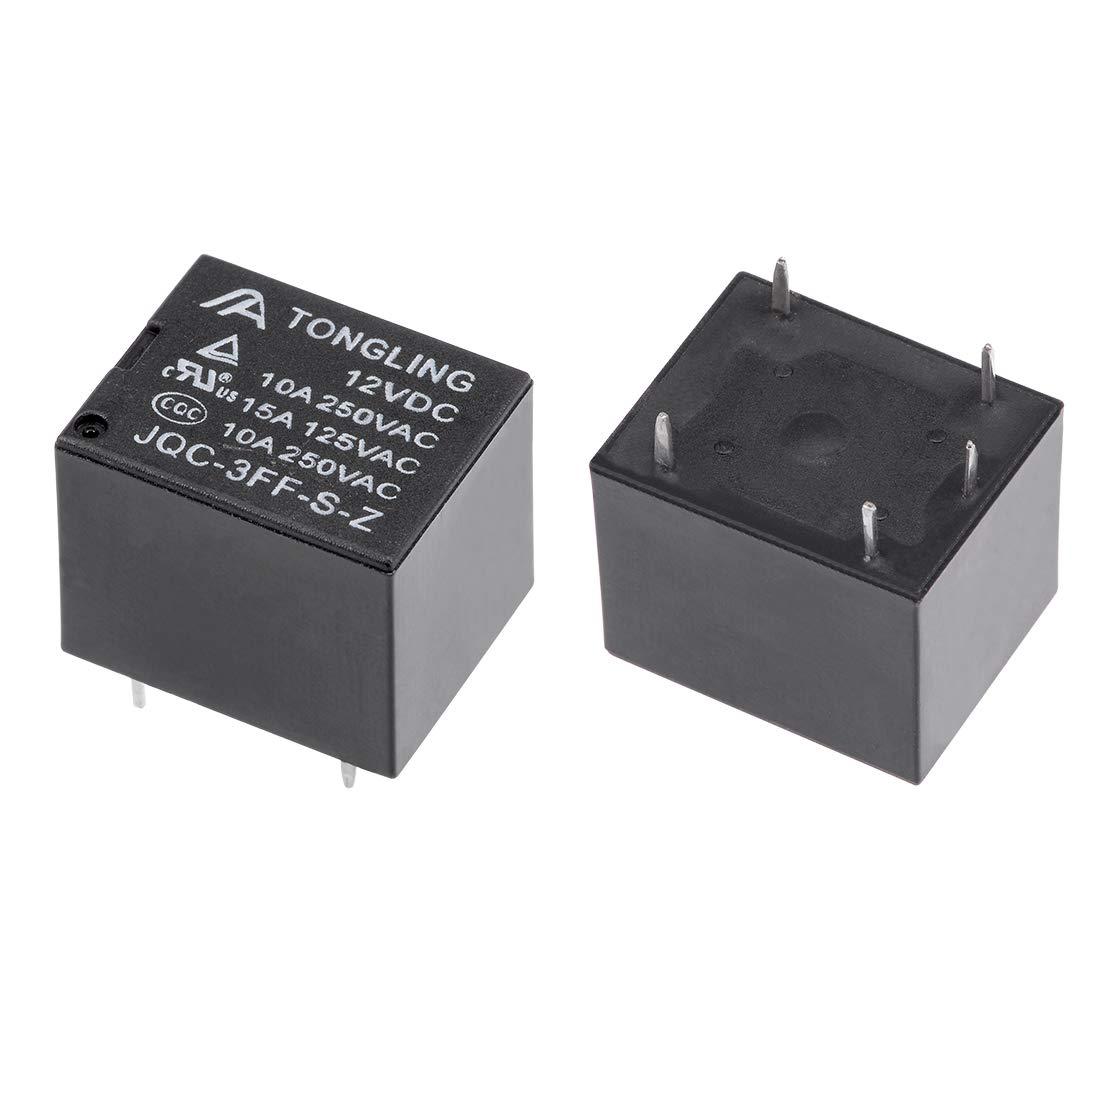 JQC-3FF-S-Z DC 12V Spule SPDT 5P PCB Elektromagnetisch Leistungsrelais DE de sourcing map 20Stk